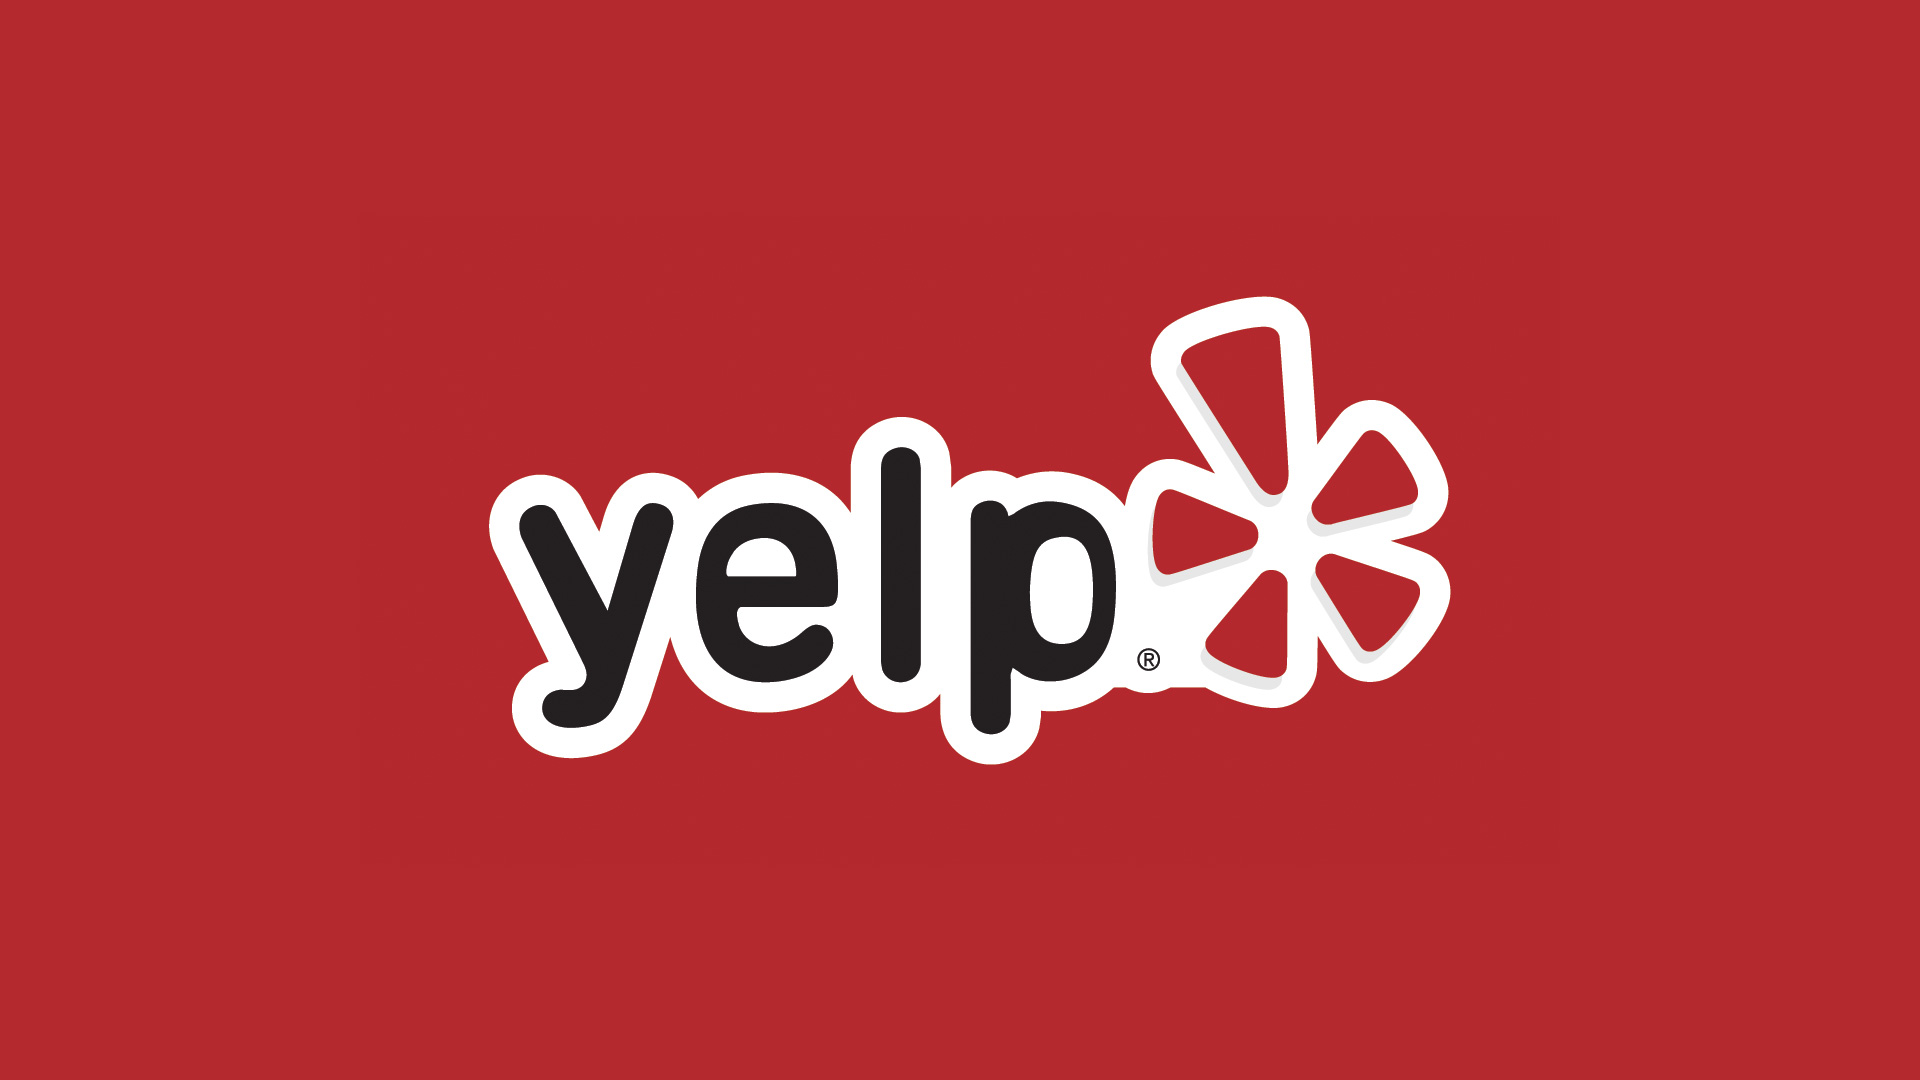 yelp site